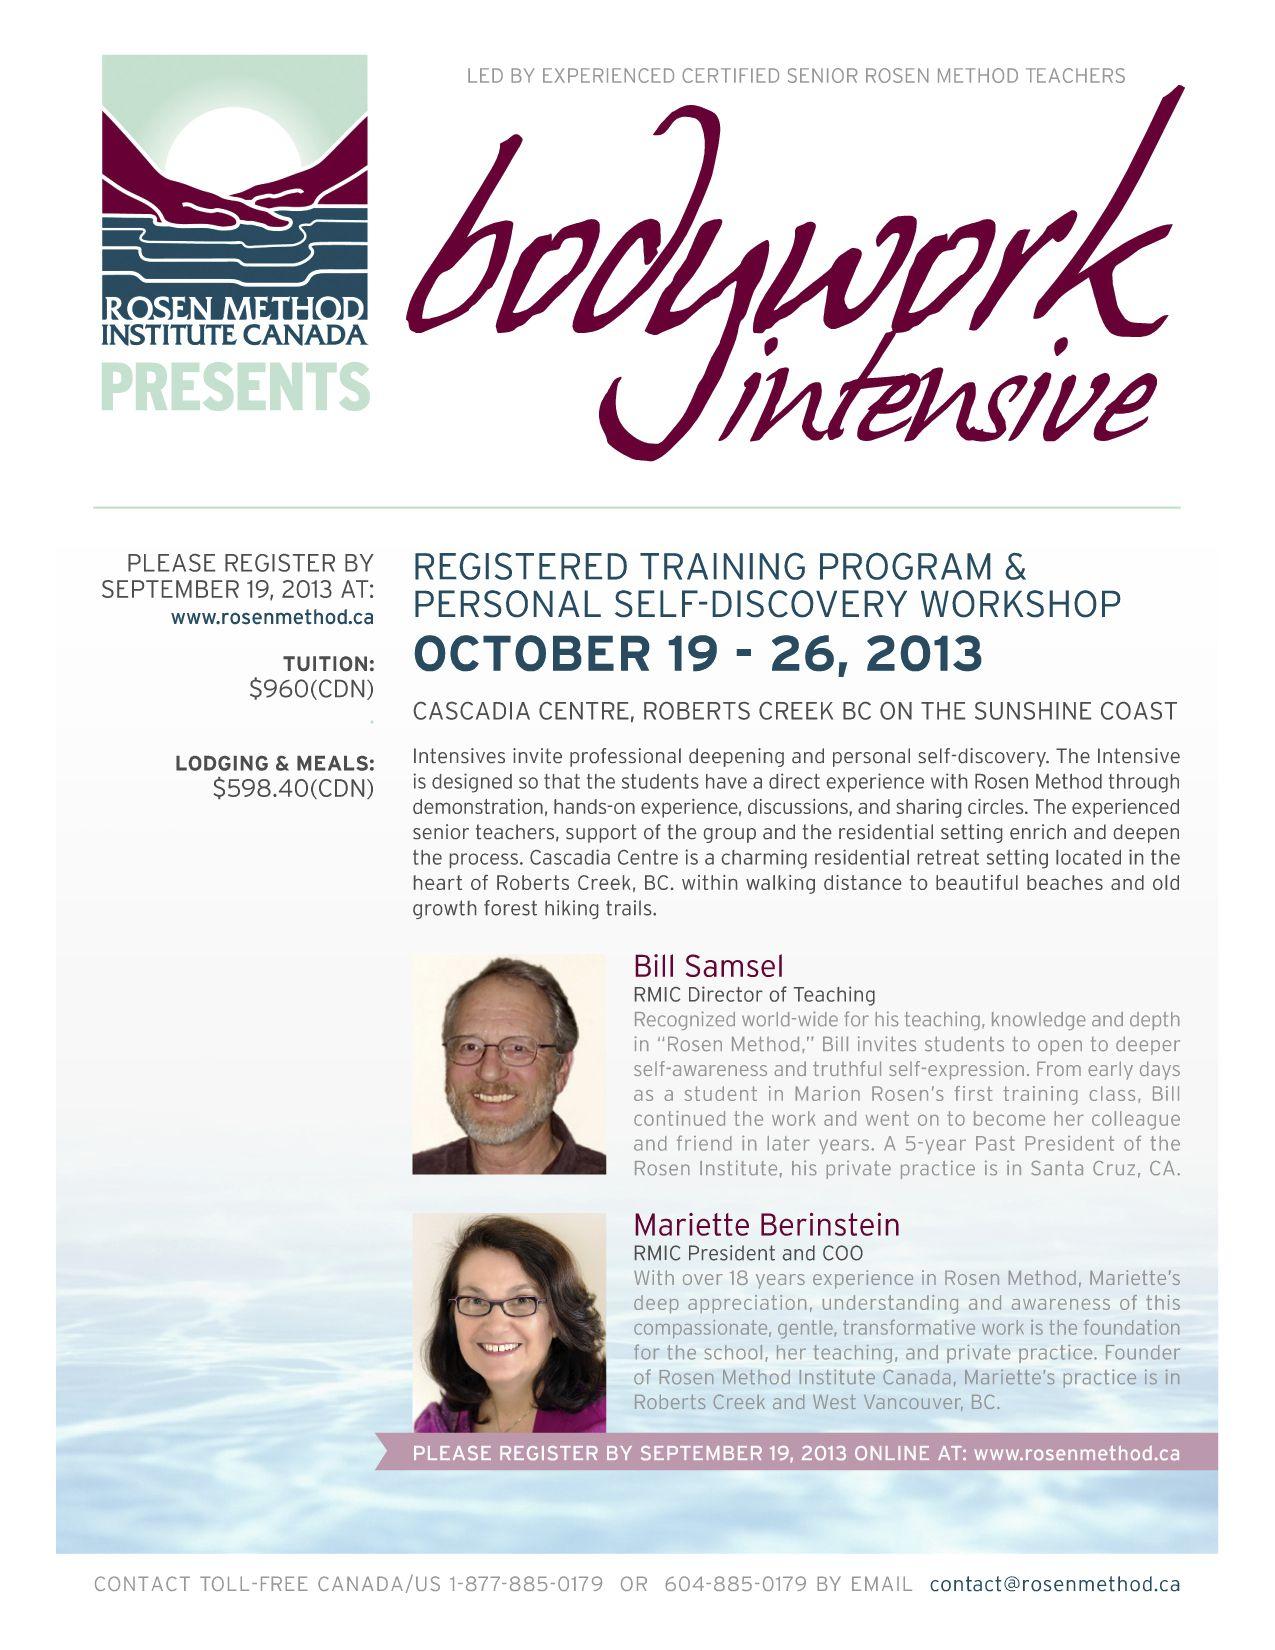 Rosen Method Bodywork Intensive Oct. 1926, 2013 (With